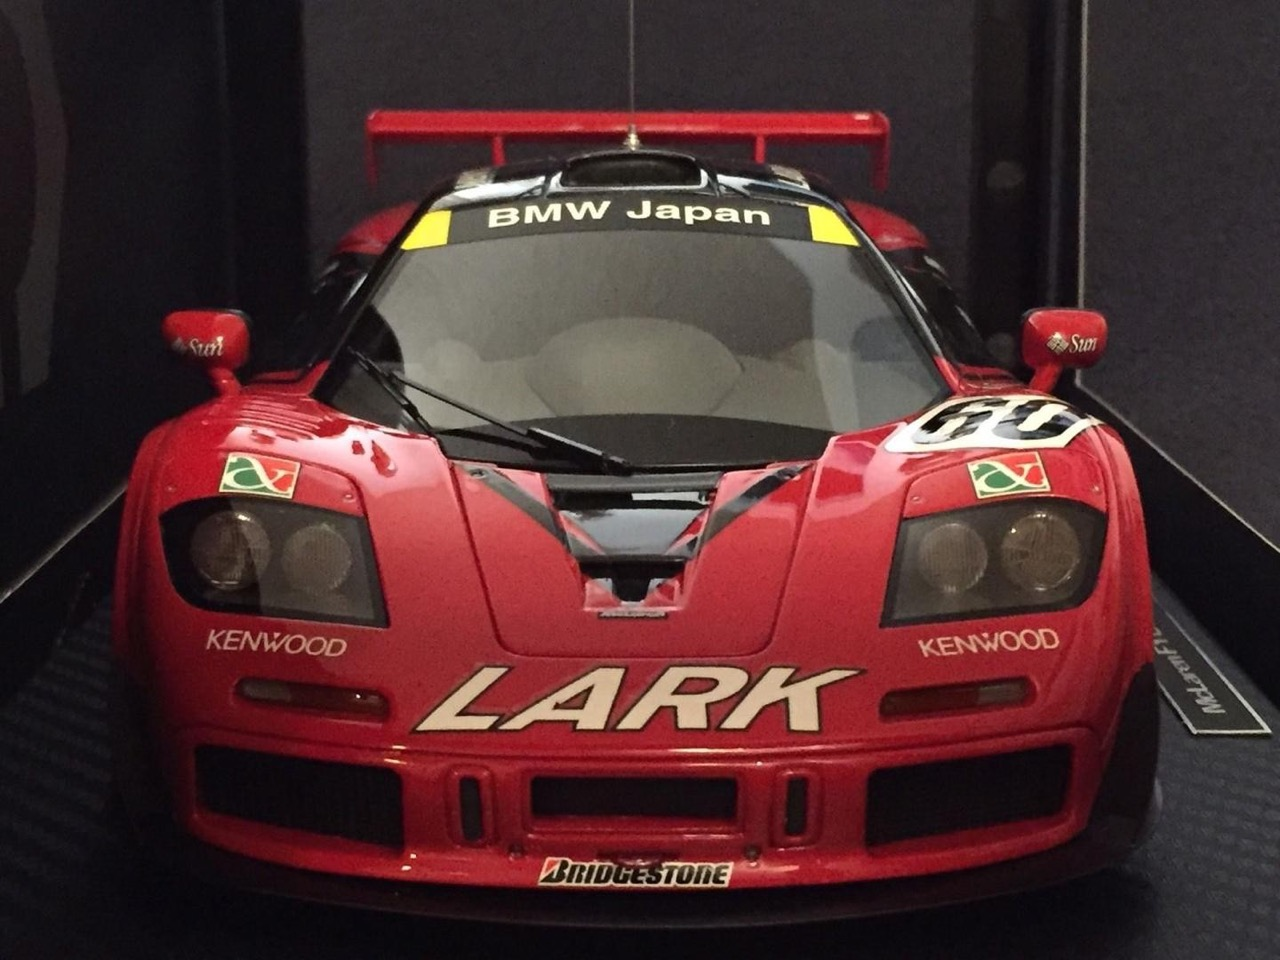 Aujourd'hui, on fait la pôle à Suzuka, avec Ralf Schumacher en McLaren F1 ! 7